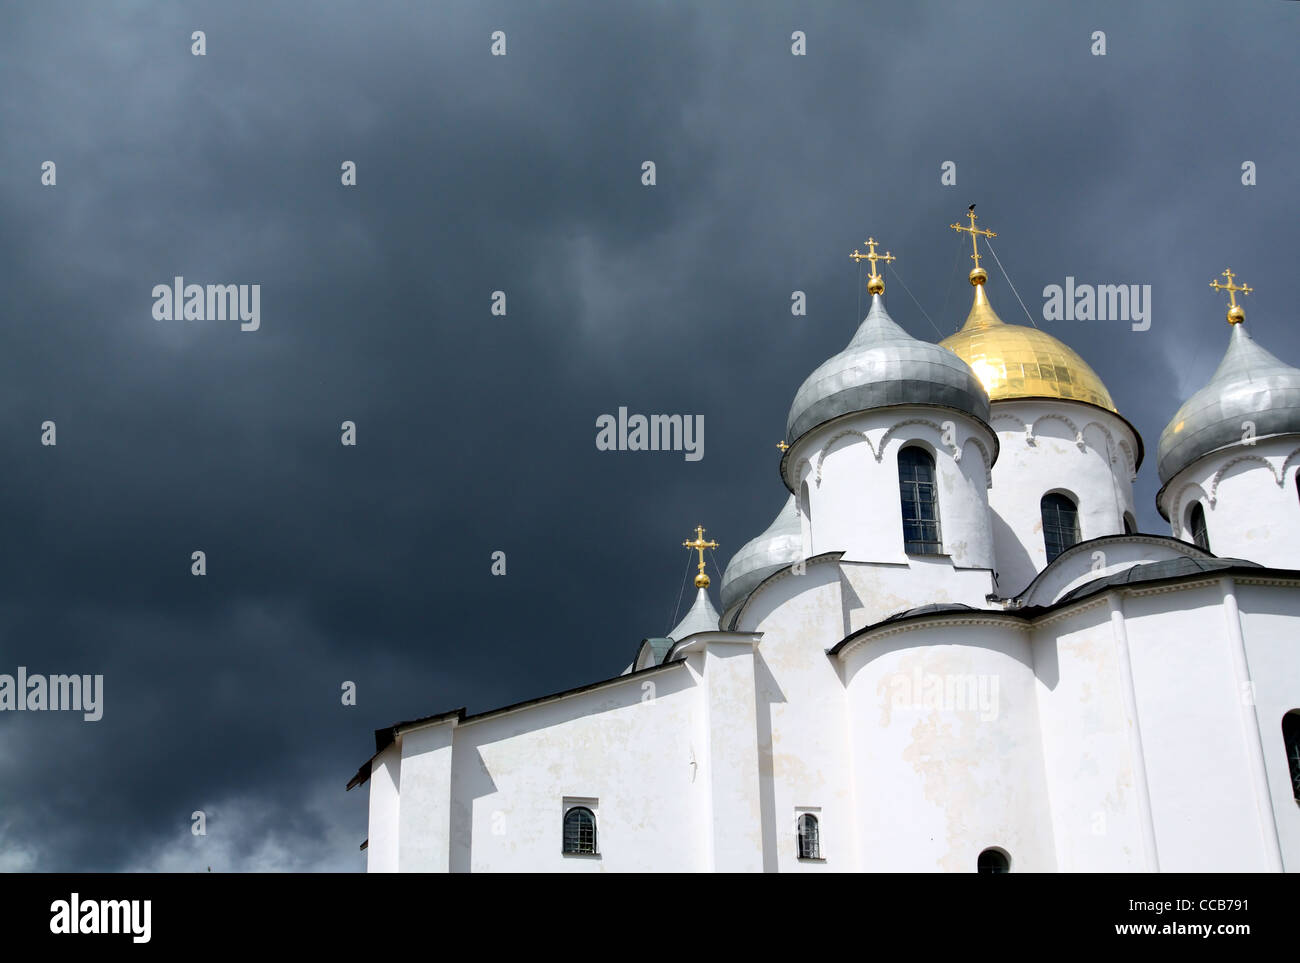 Iglesia ortodoxa cristiana sobre el fondo nublado Imagen De Stock